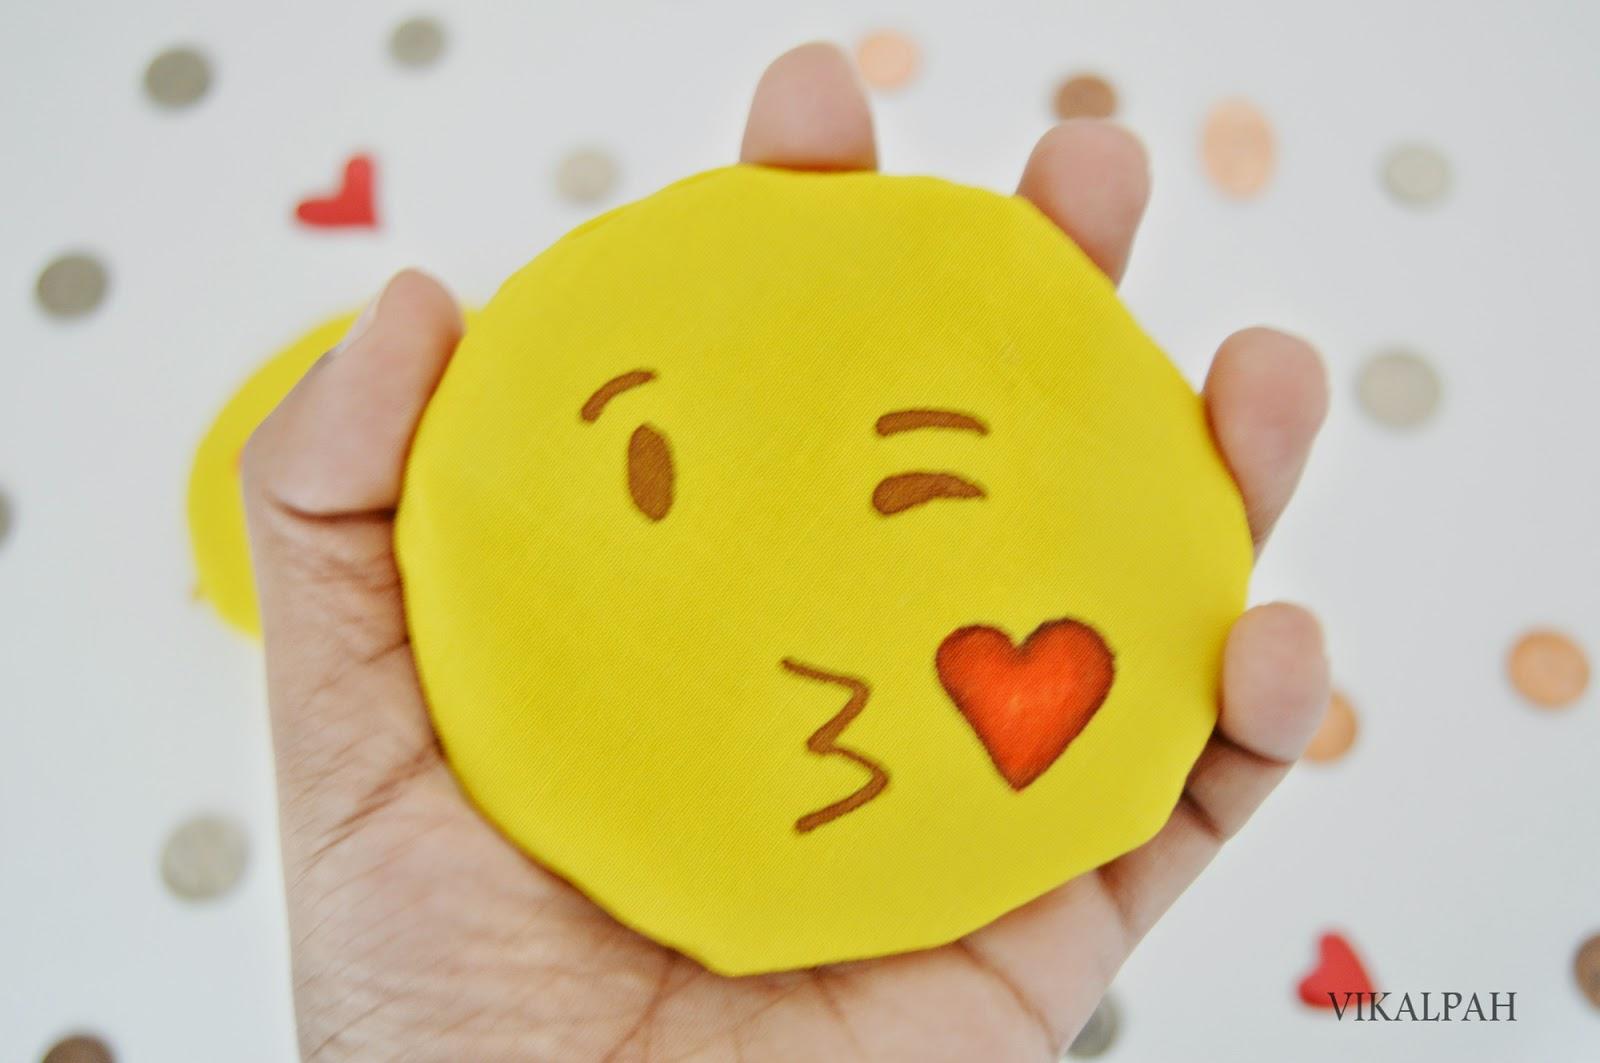 Vikalpah: How to make Emoji Coin purses - Valentine's day